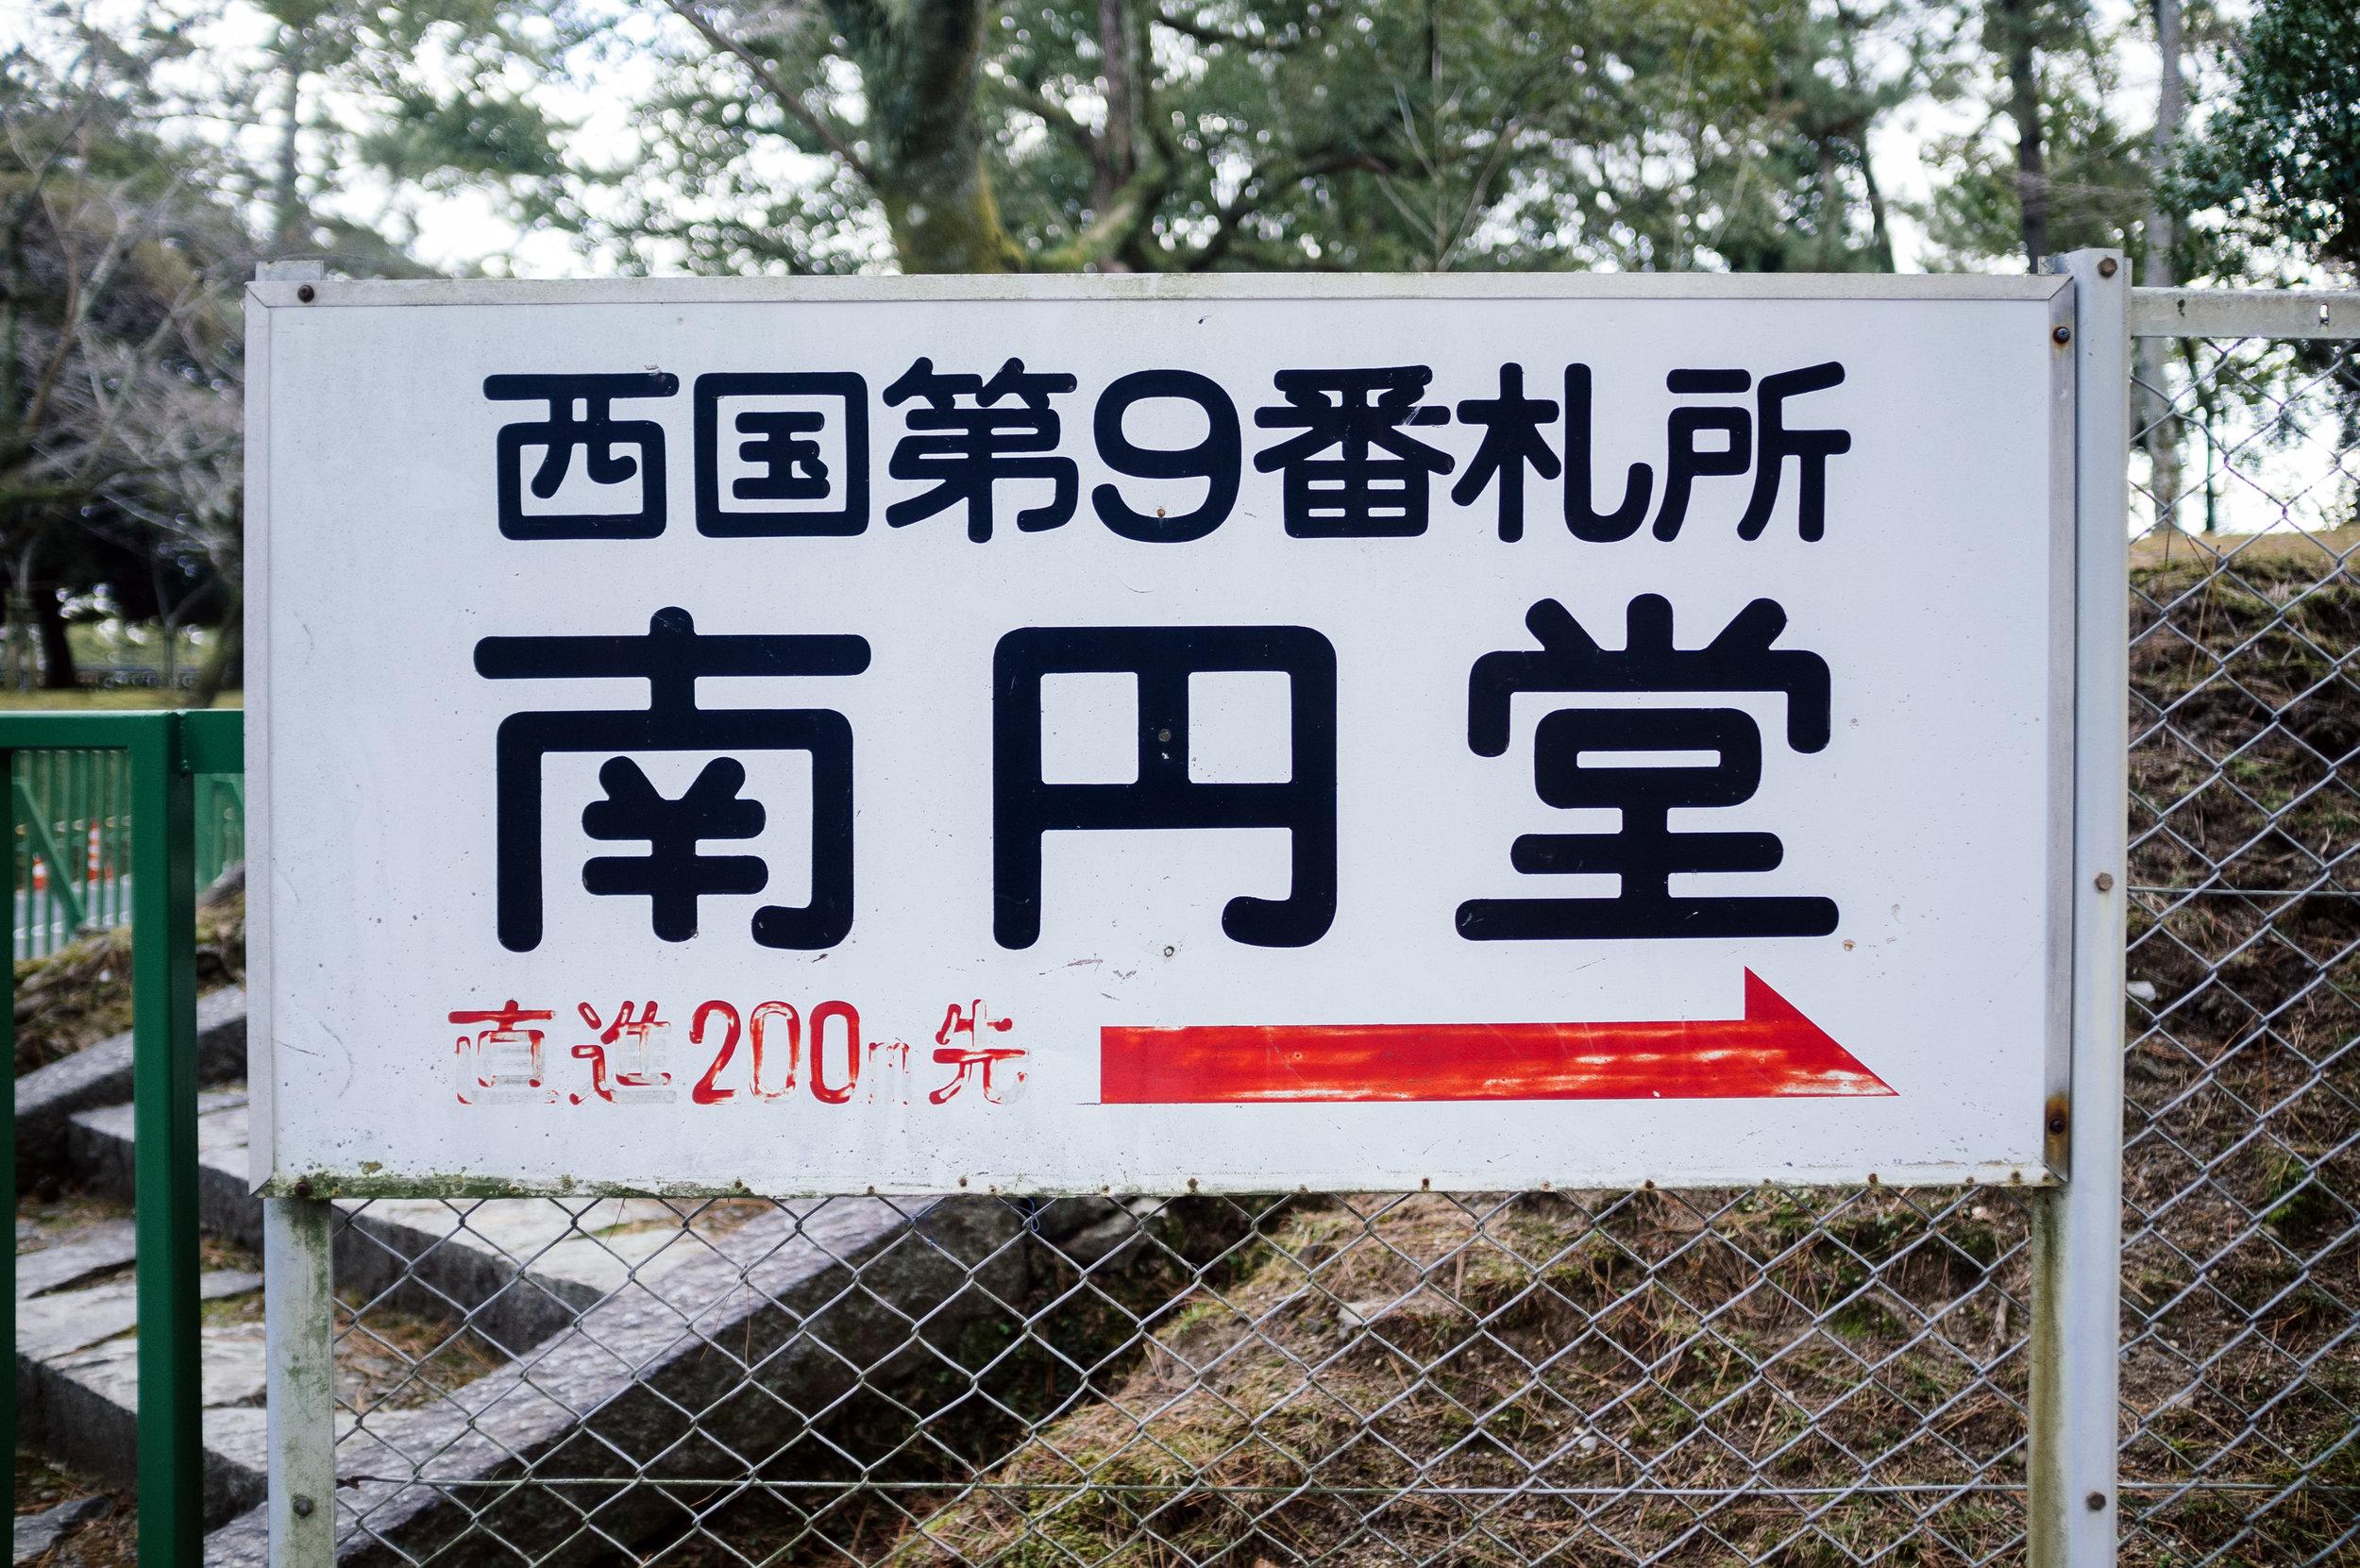 Nara Sign 2.jpg